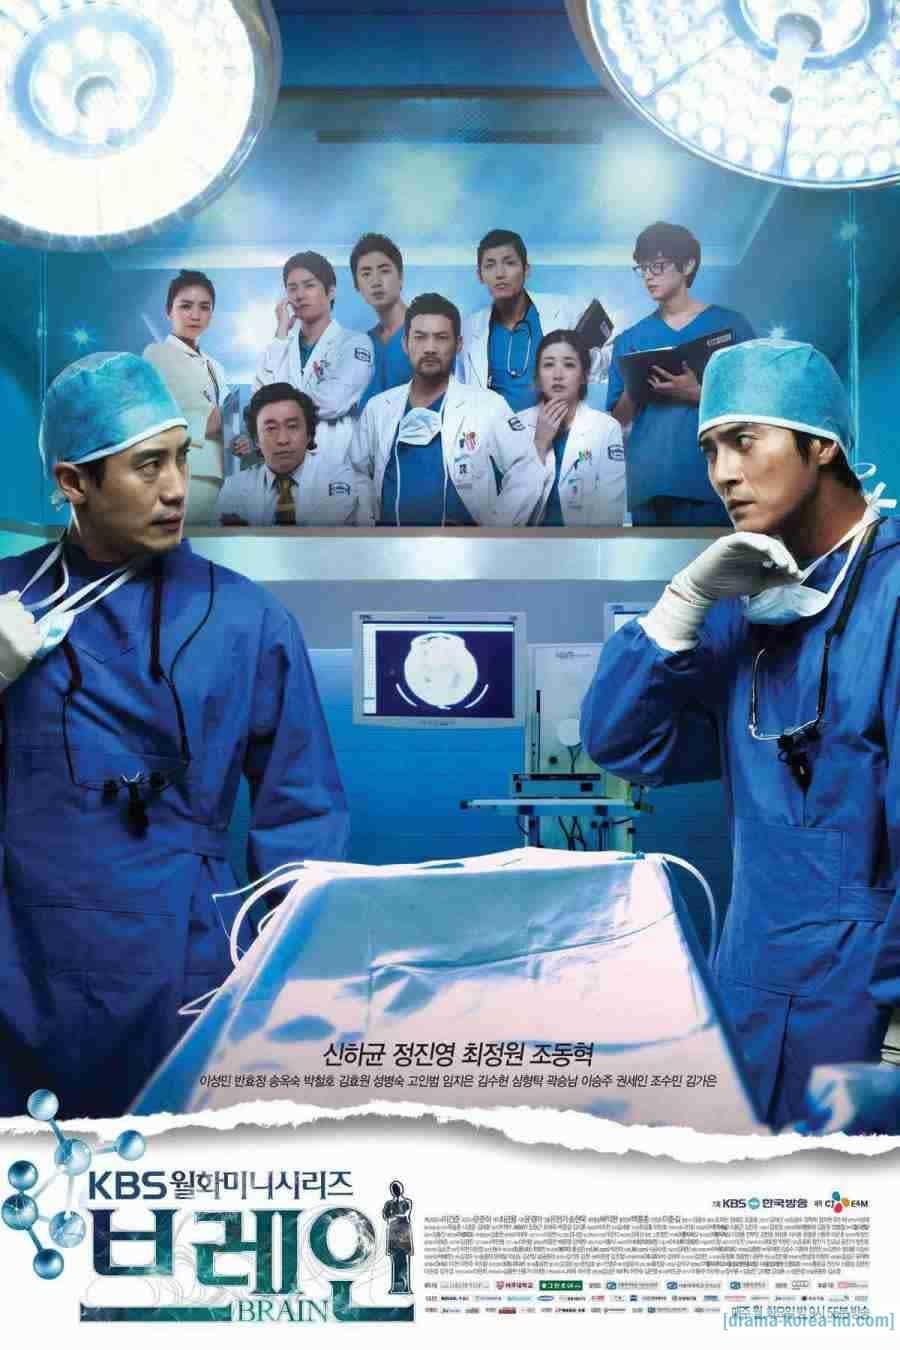 brain - all episode drama korea